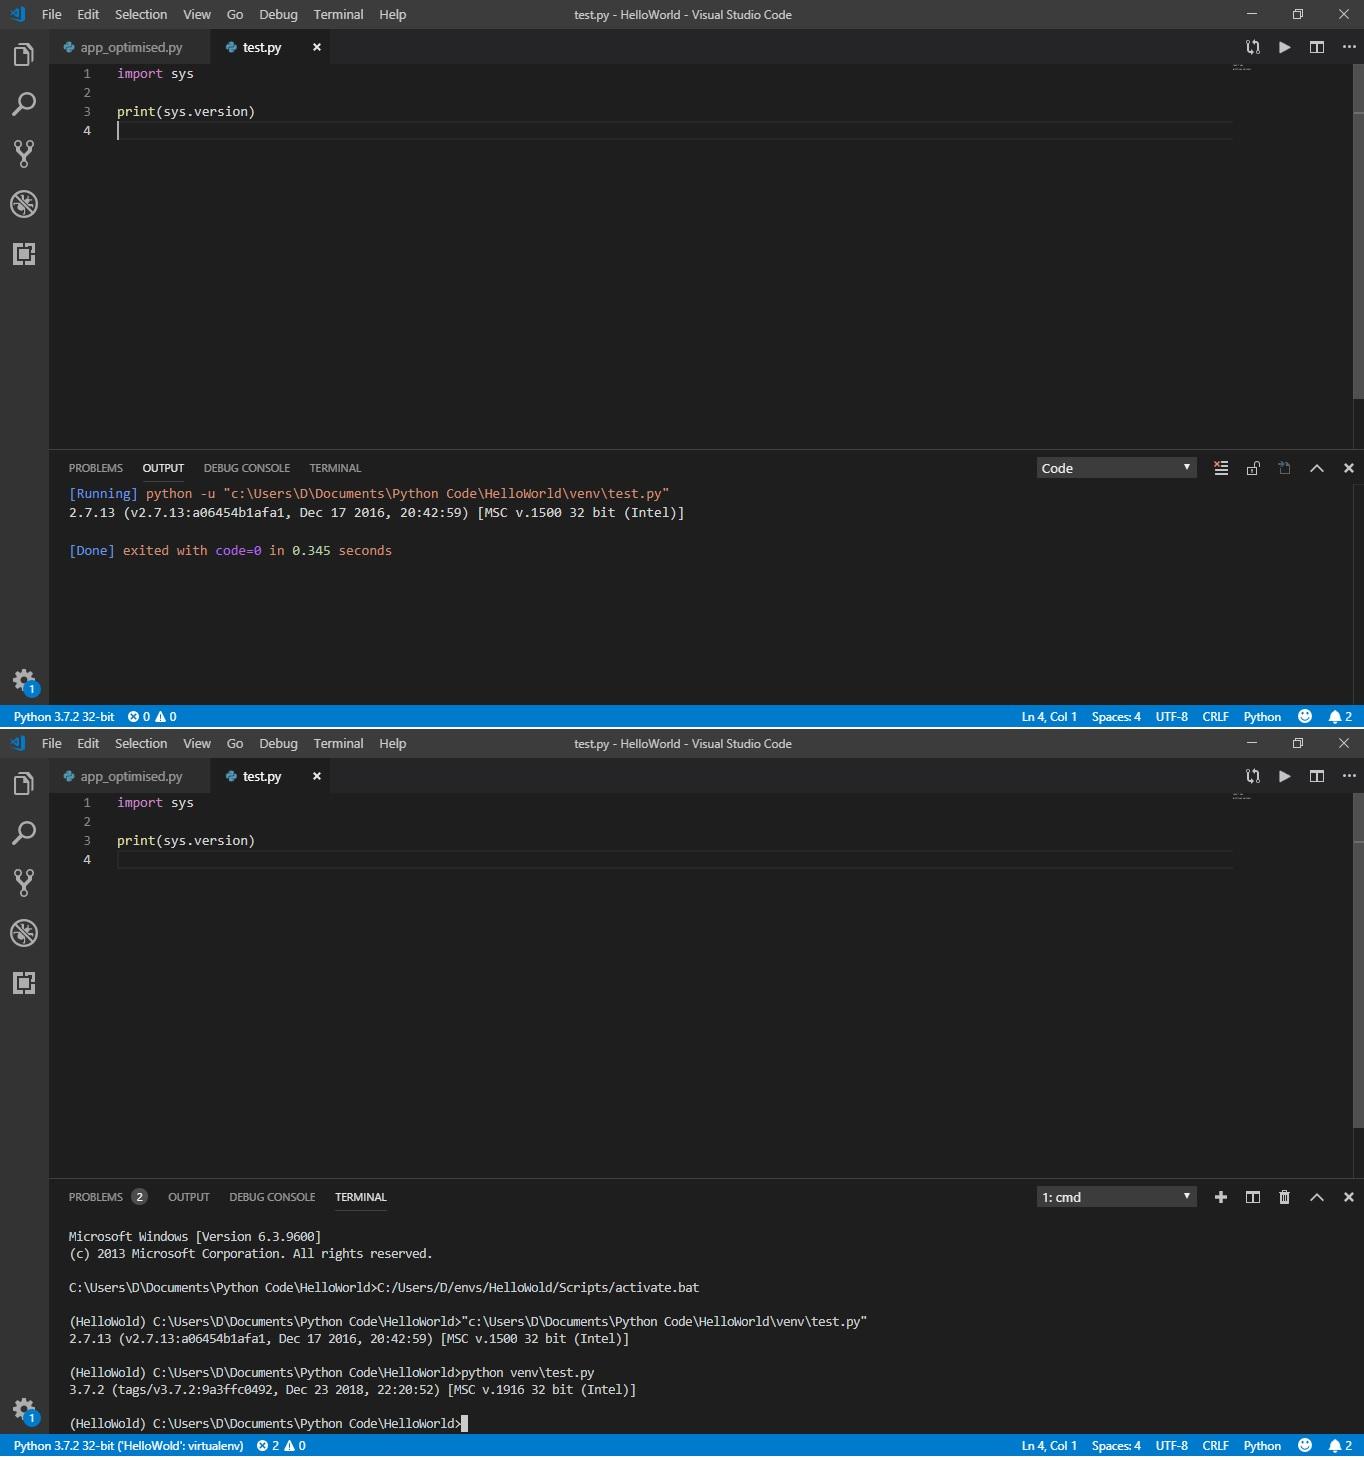 Visual Studio Code not using the selected Python environment